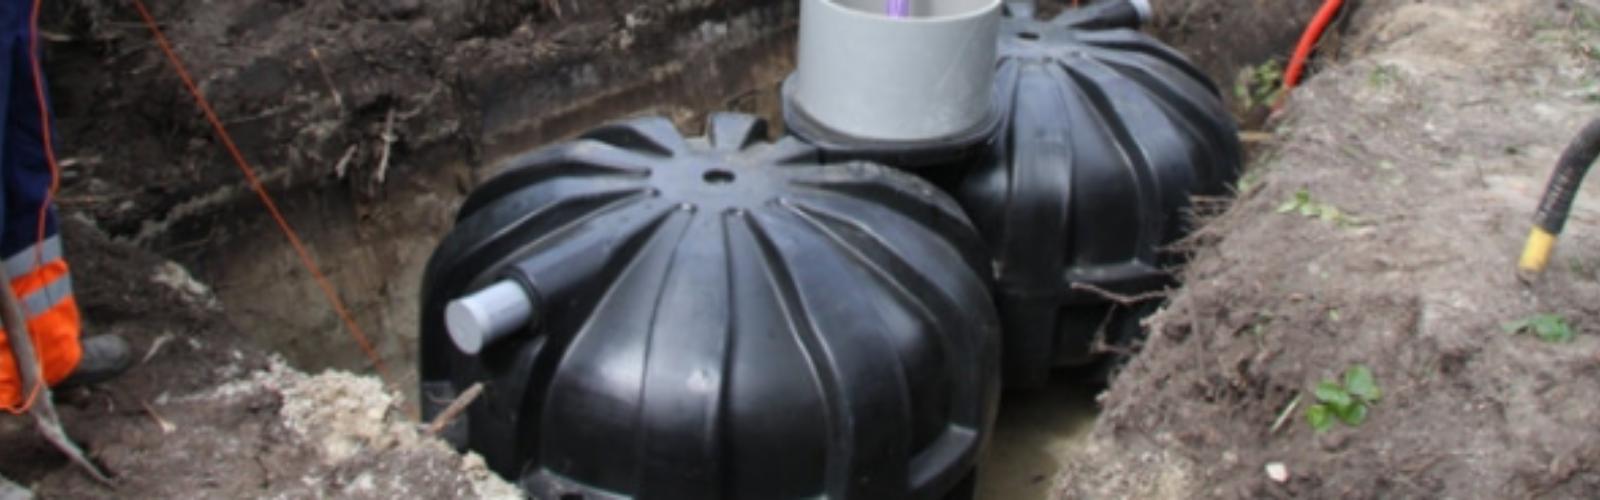 Individuele waterzuiveringsstations